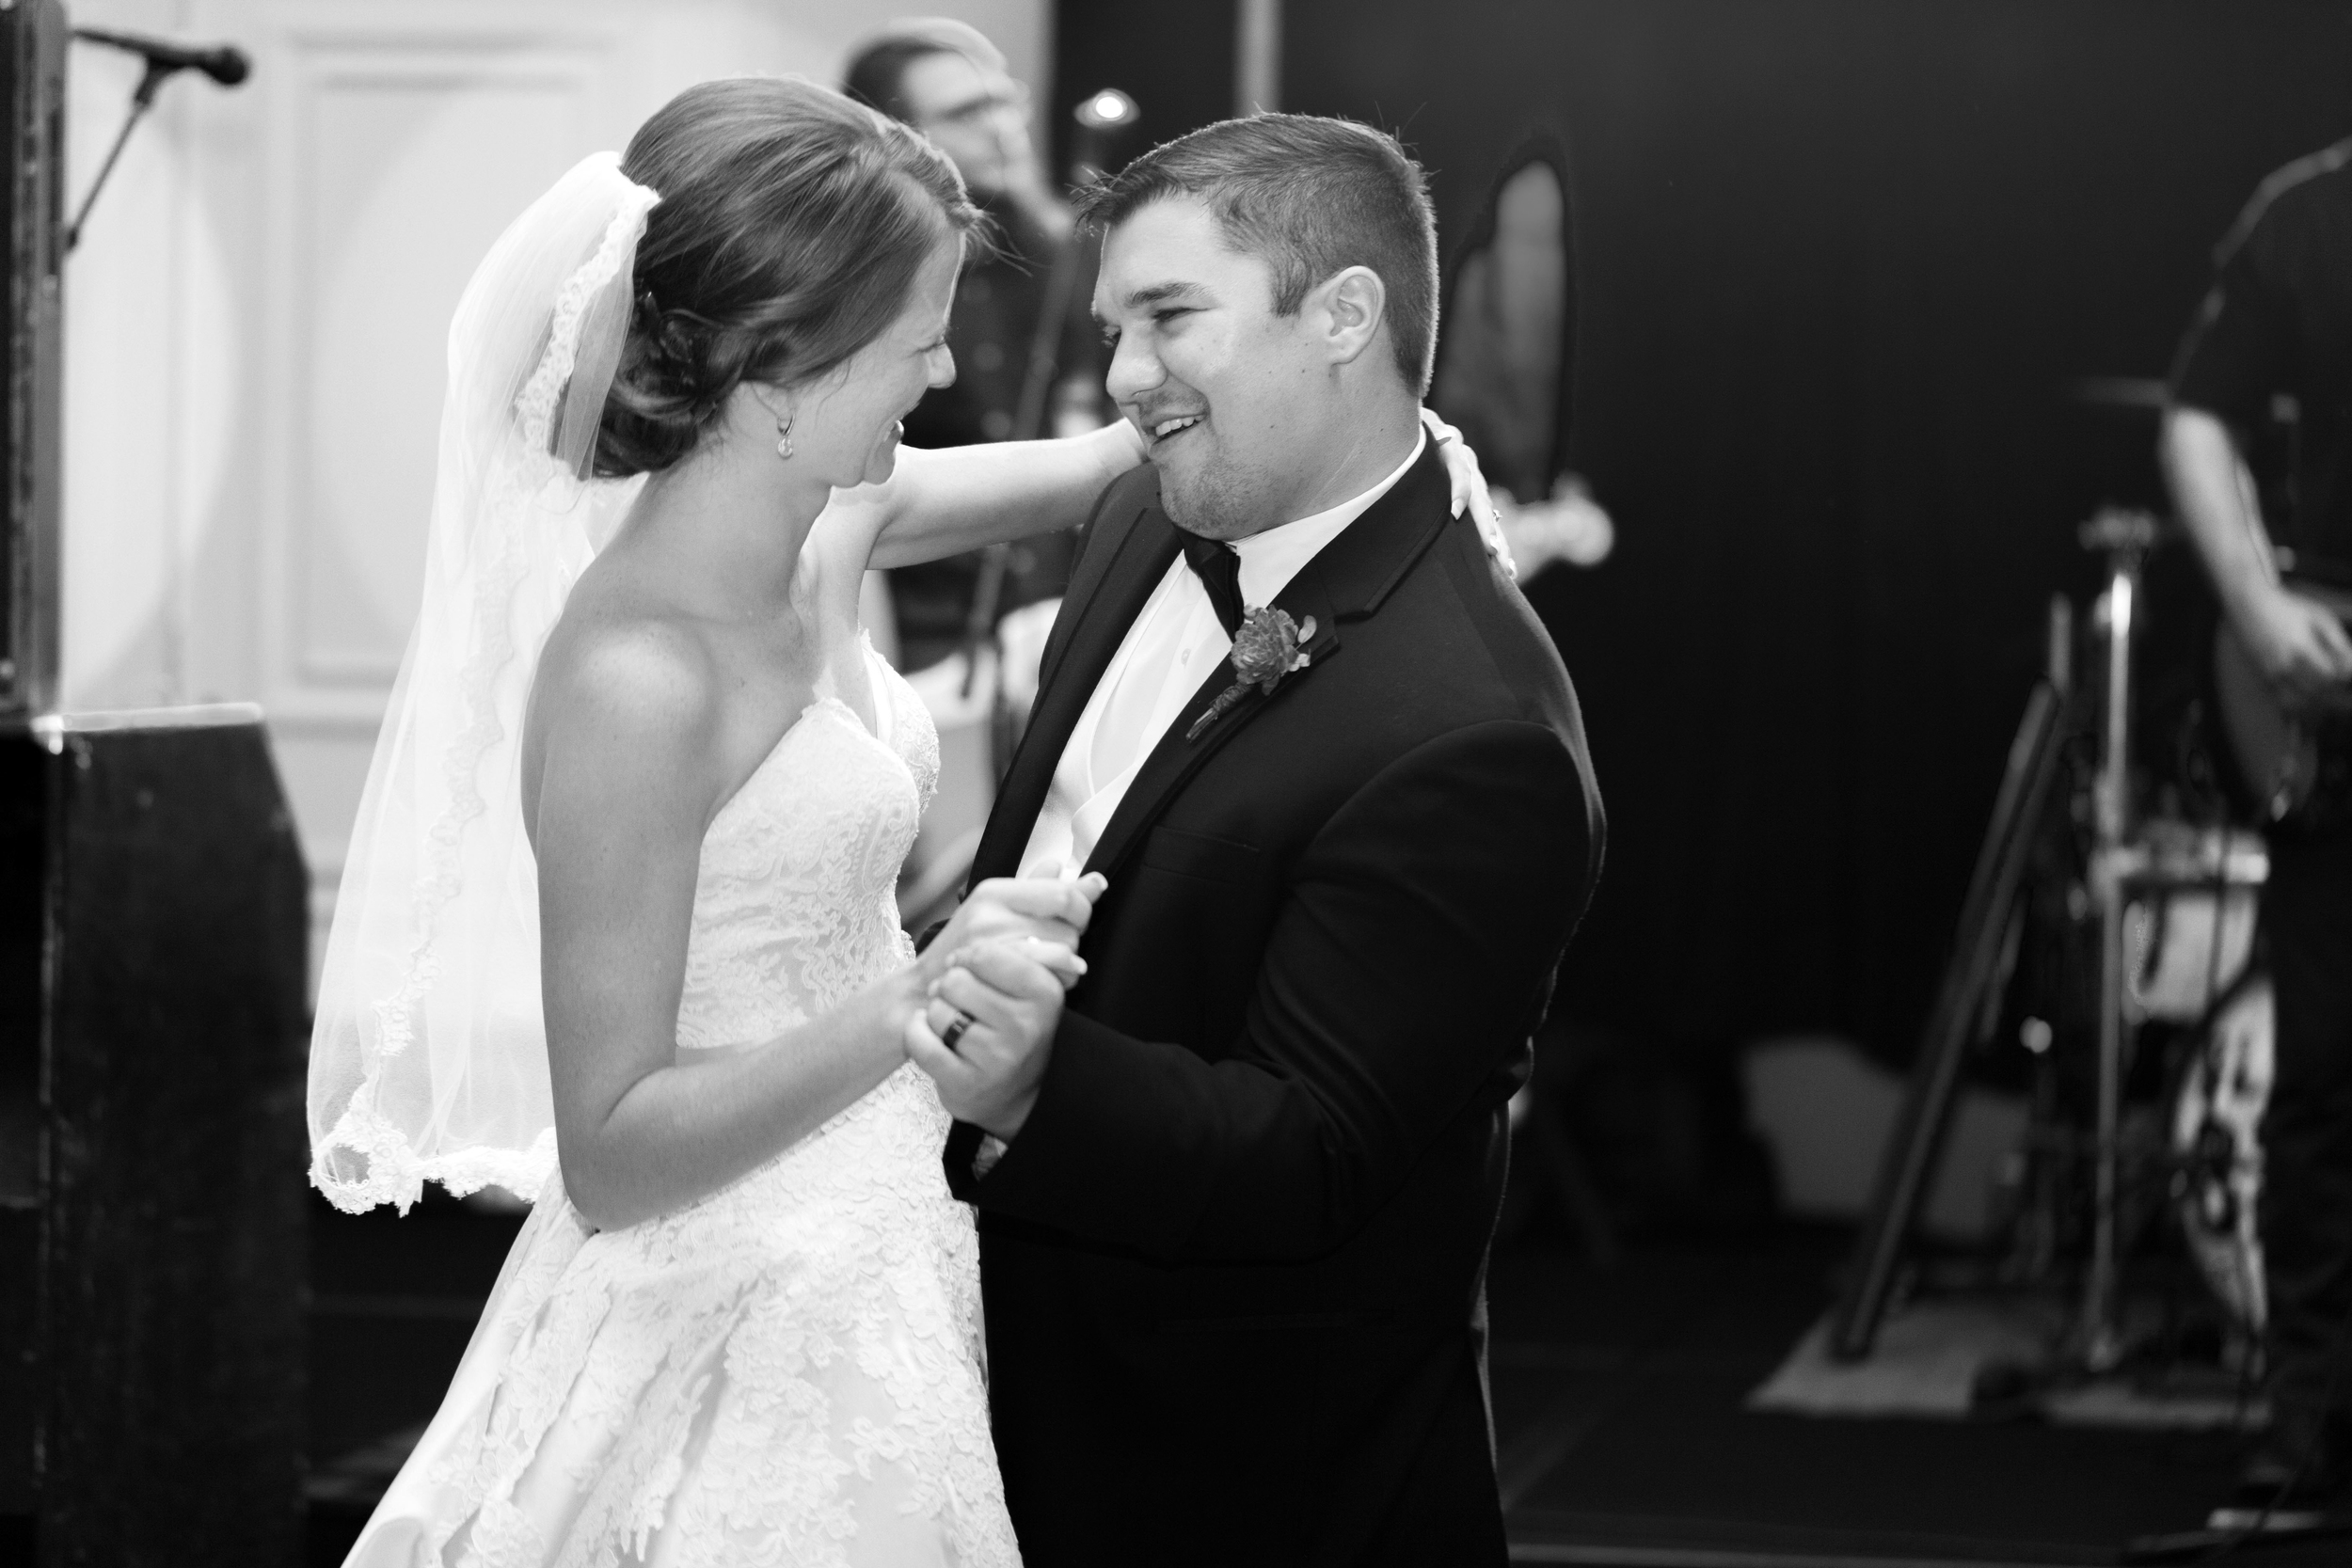 Brewbaker-Wedding-Montgomery-Alabama-Nick-Drollette-135.jpg